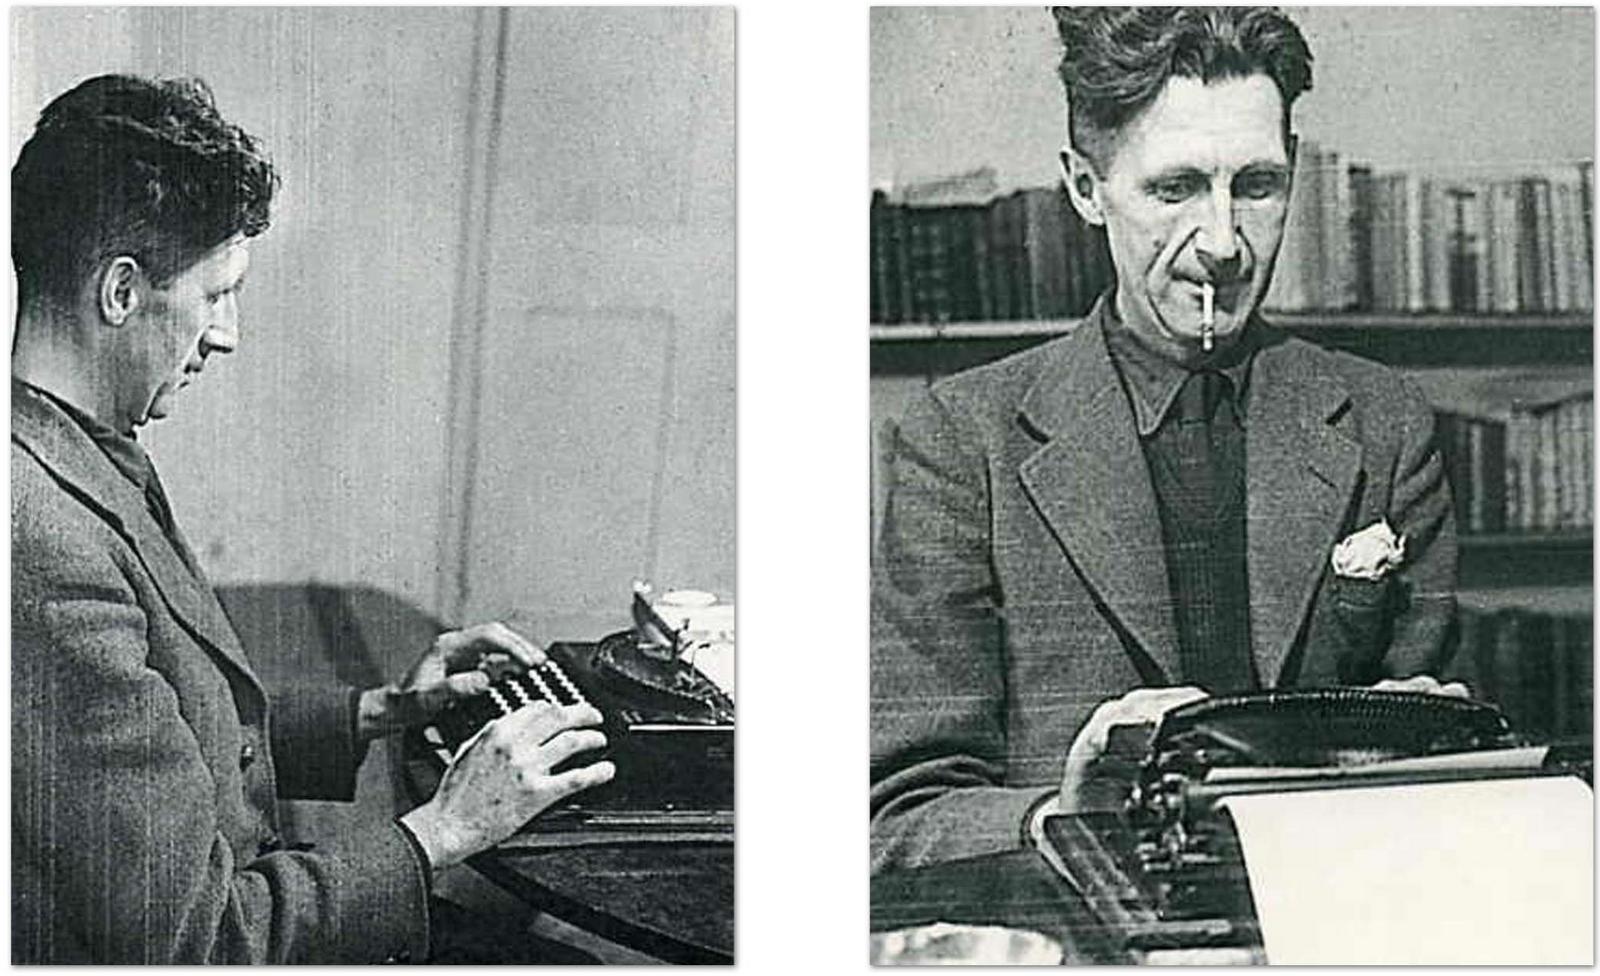 george orwell 1984 essay help george orwell essay on writing millicent rogers museum essay nuclear nursing essay help ukrainian essay